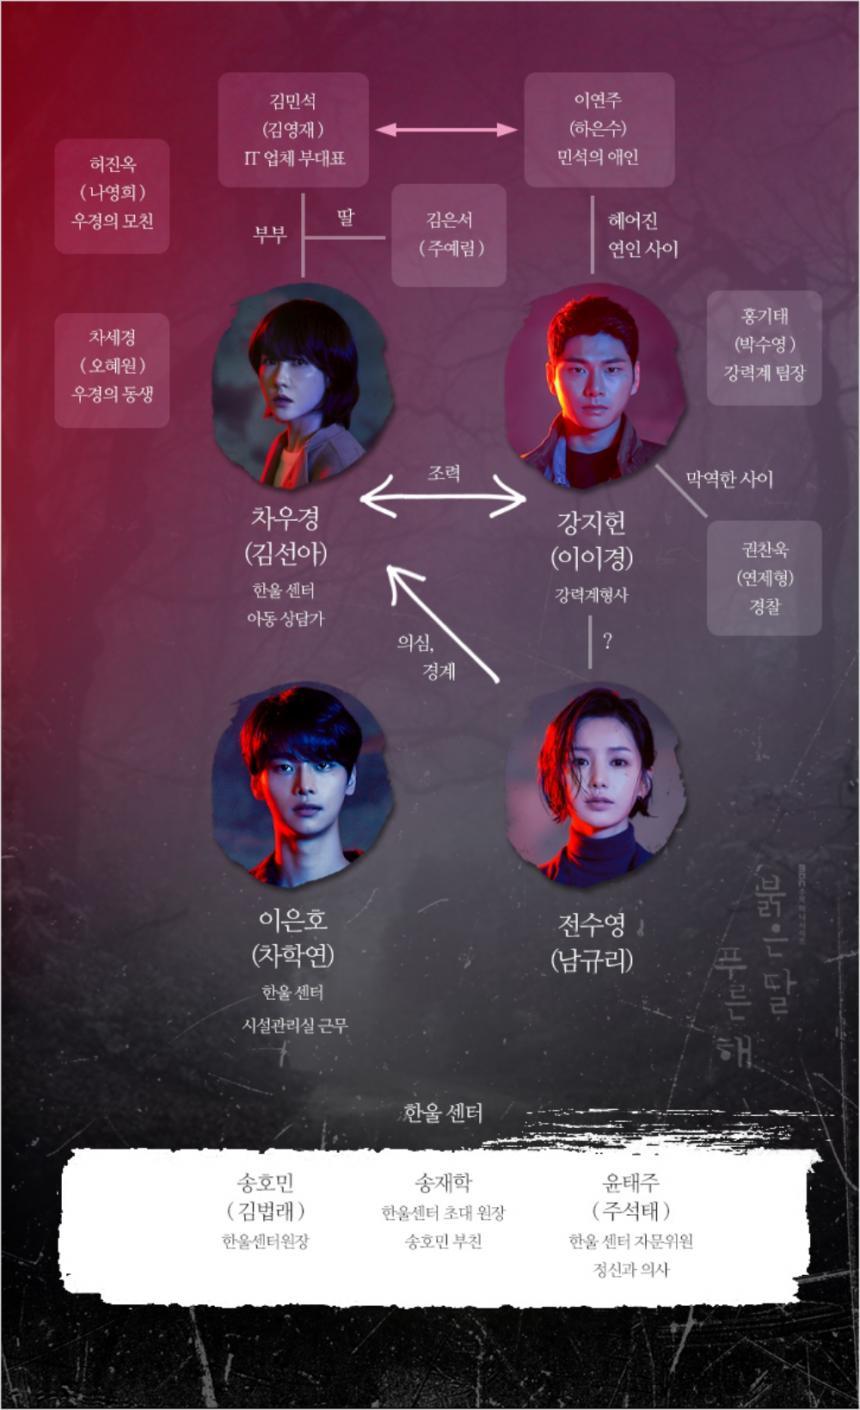 MBC '붉은달 푸른해' 홈페이지